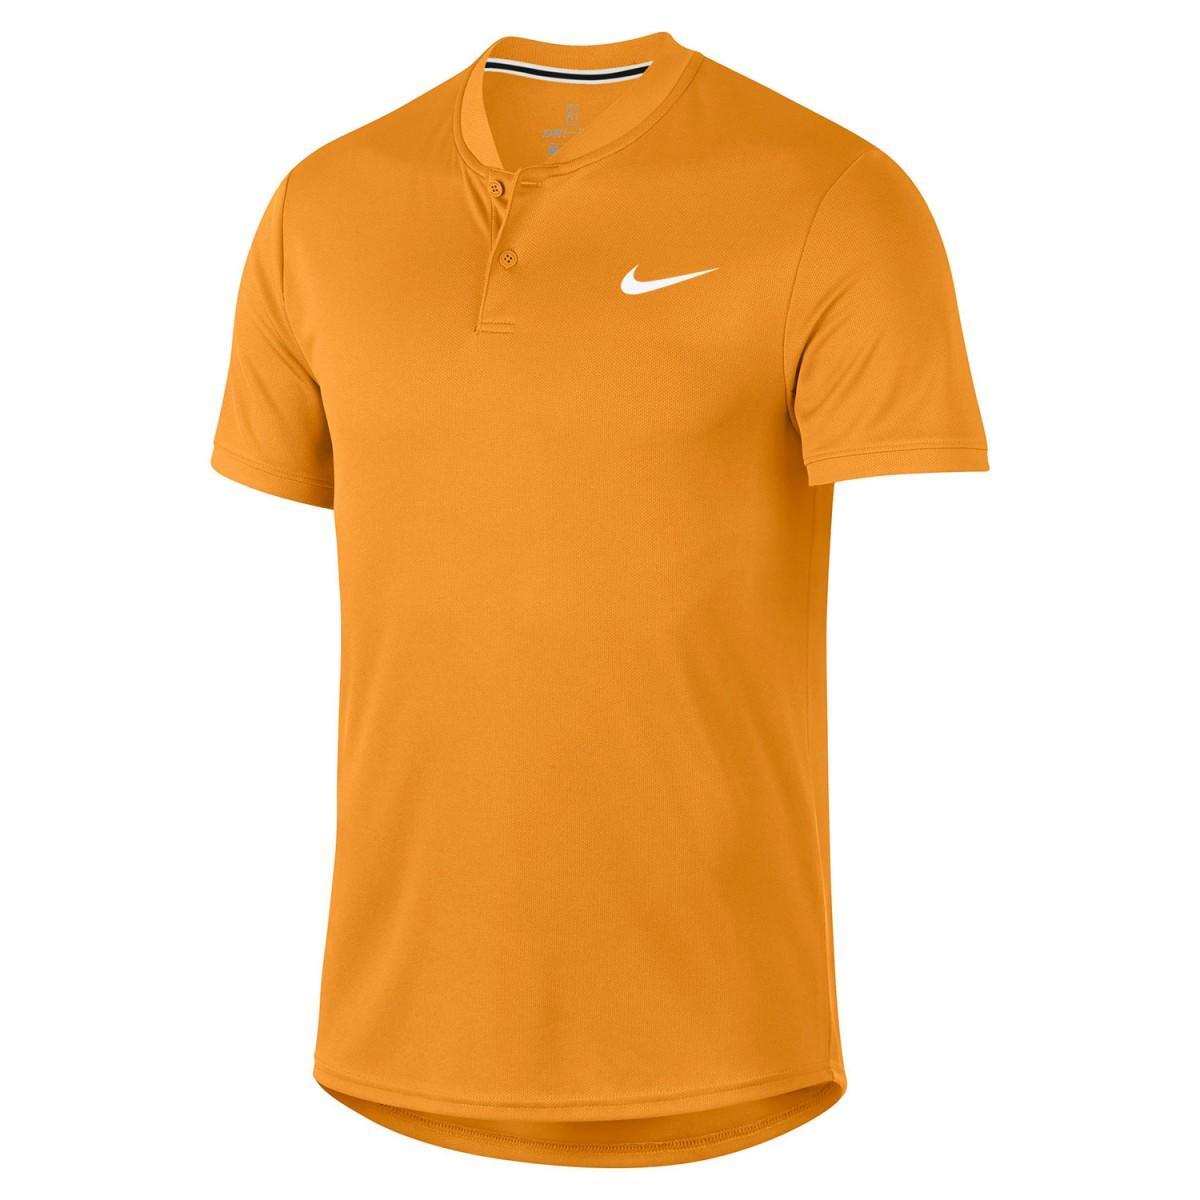 1f57a343 Теннисная футболка мужская Nike Court Dry Blade Polo canyon gold/white